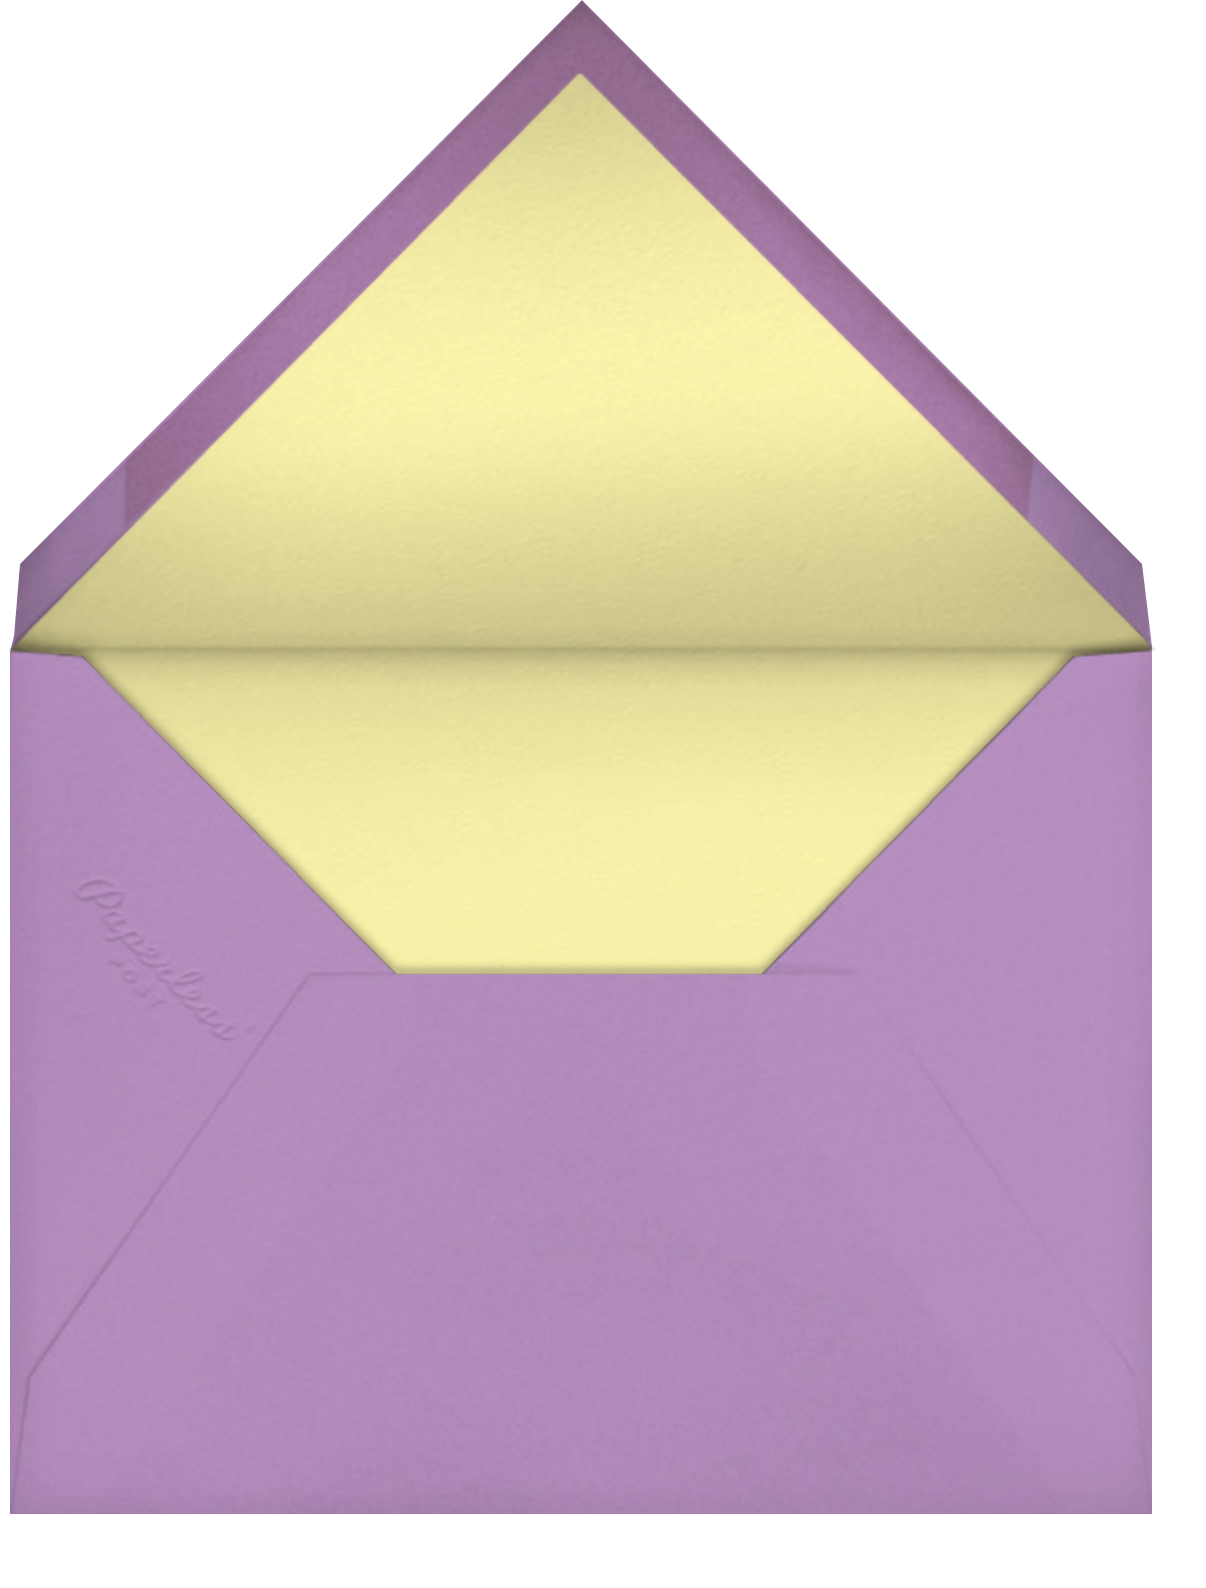 Garden Gingham - Lilac - kate spade new york - Spring parties - envelope back